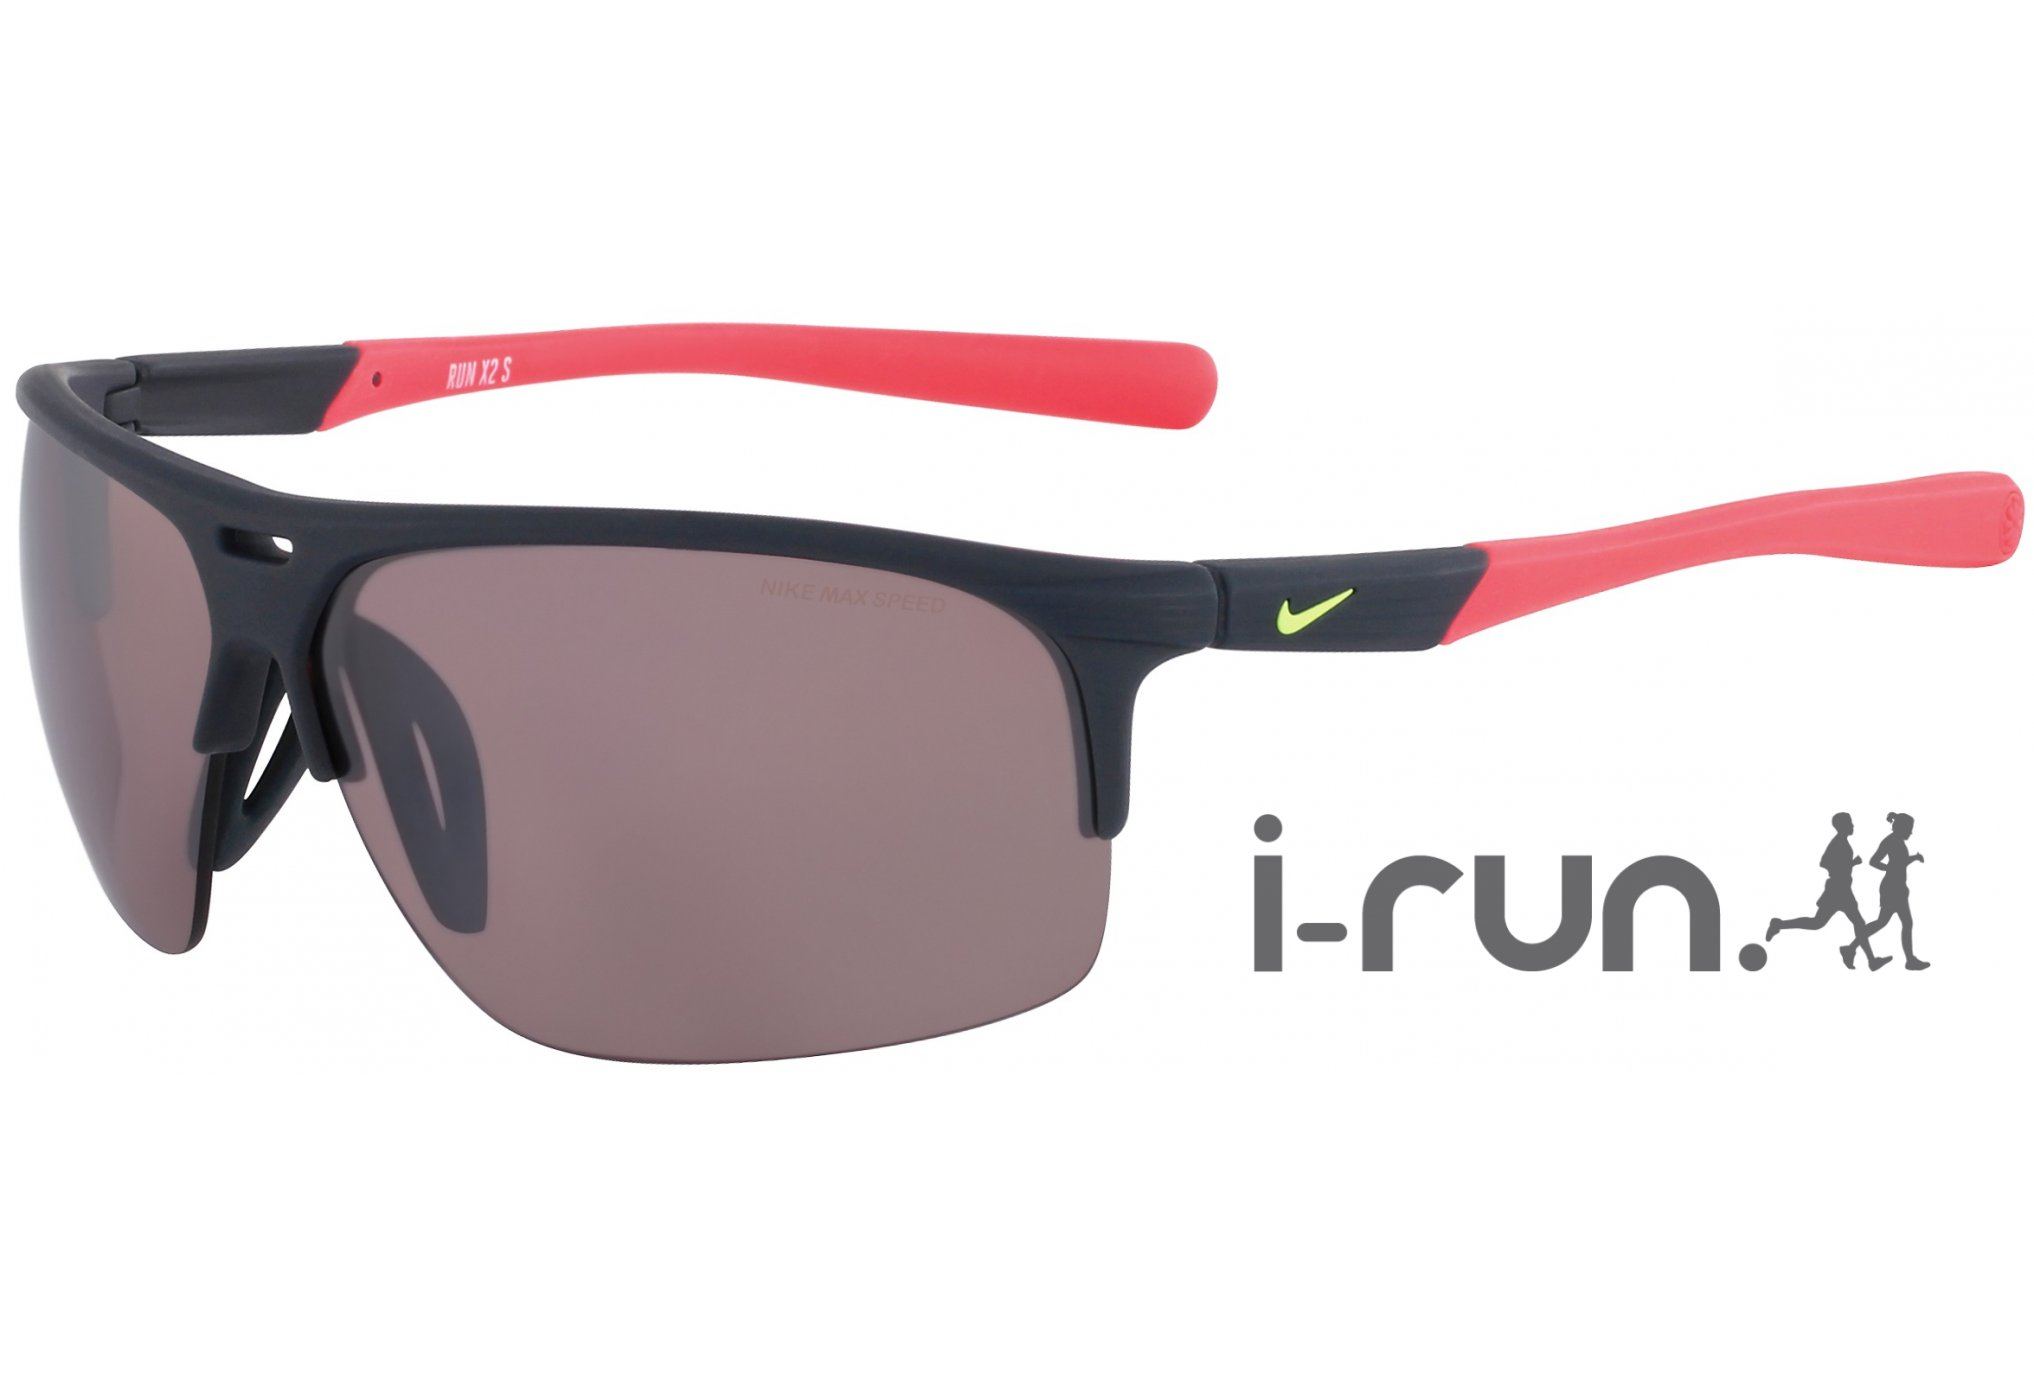 Nike Lunettes Run X2 S E Lunettes